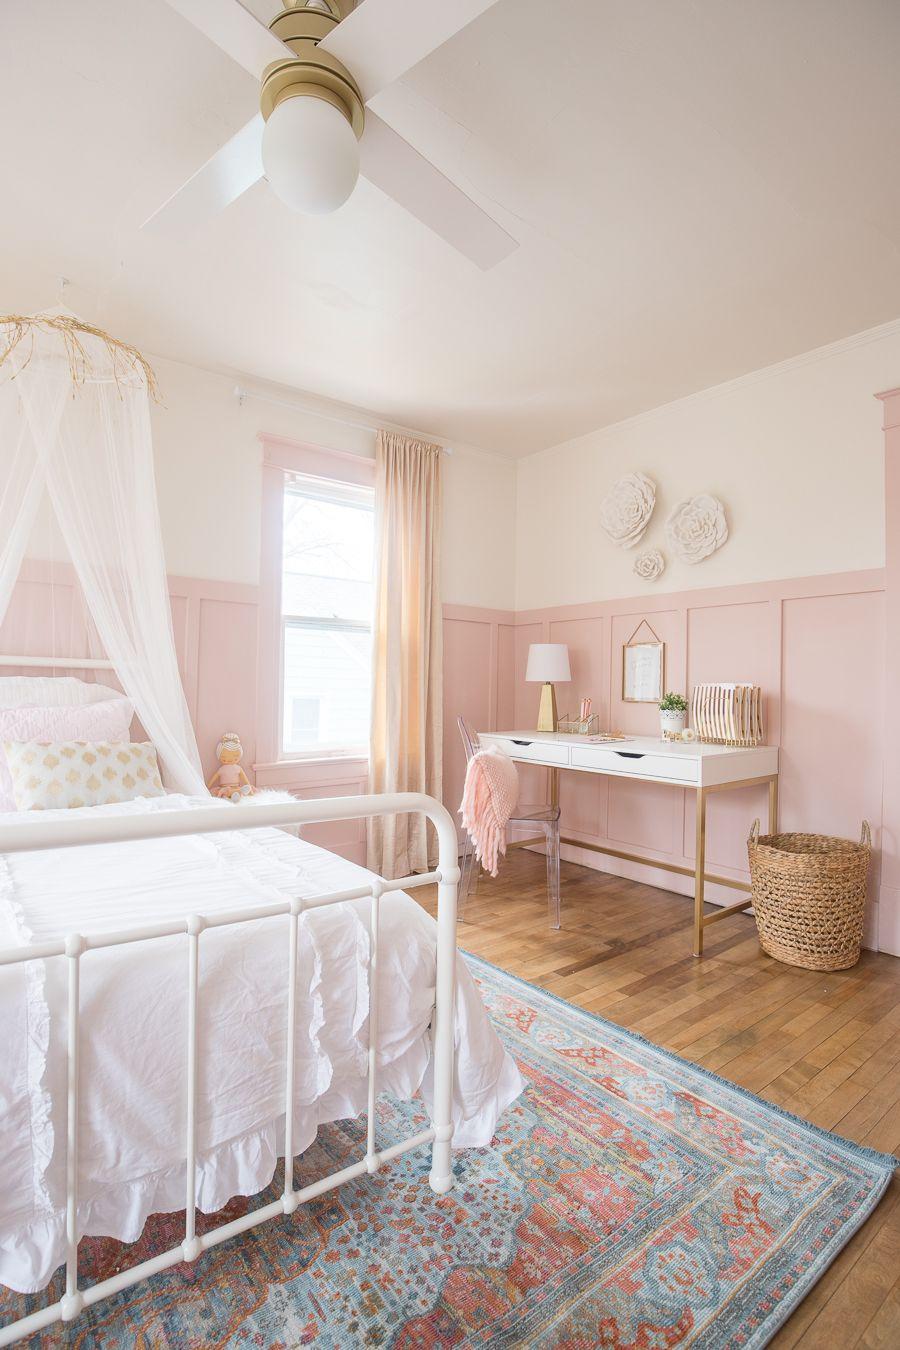 Pink & Gold Girls Bedroom Decor Ideas | Cherished Bliss